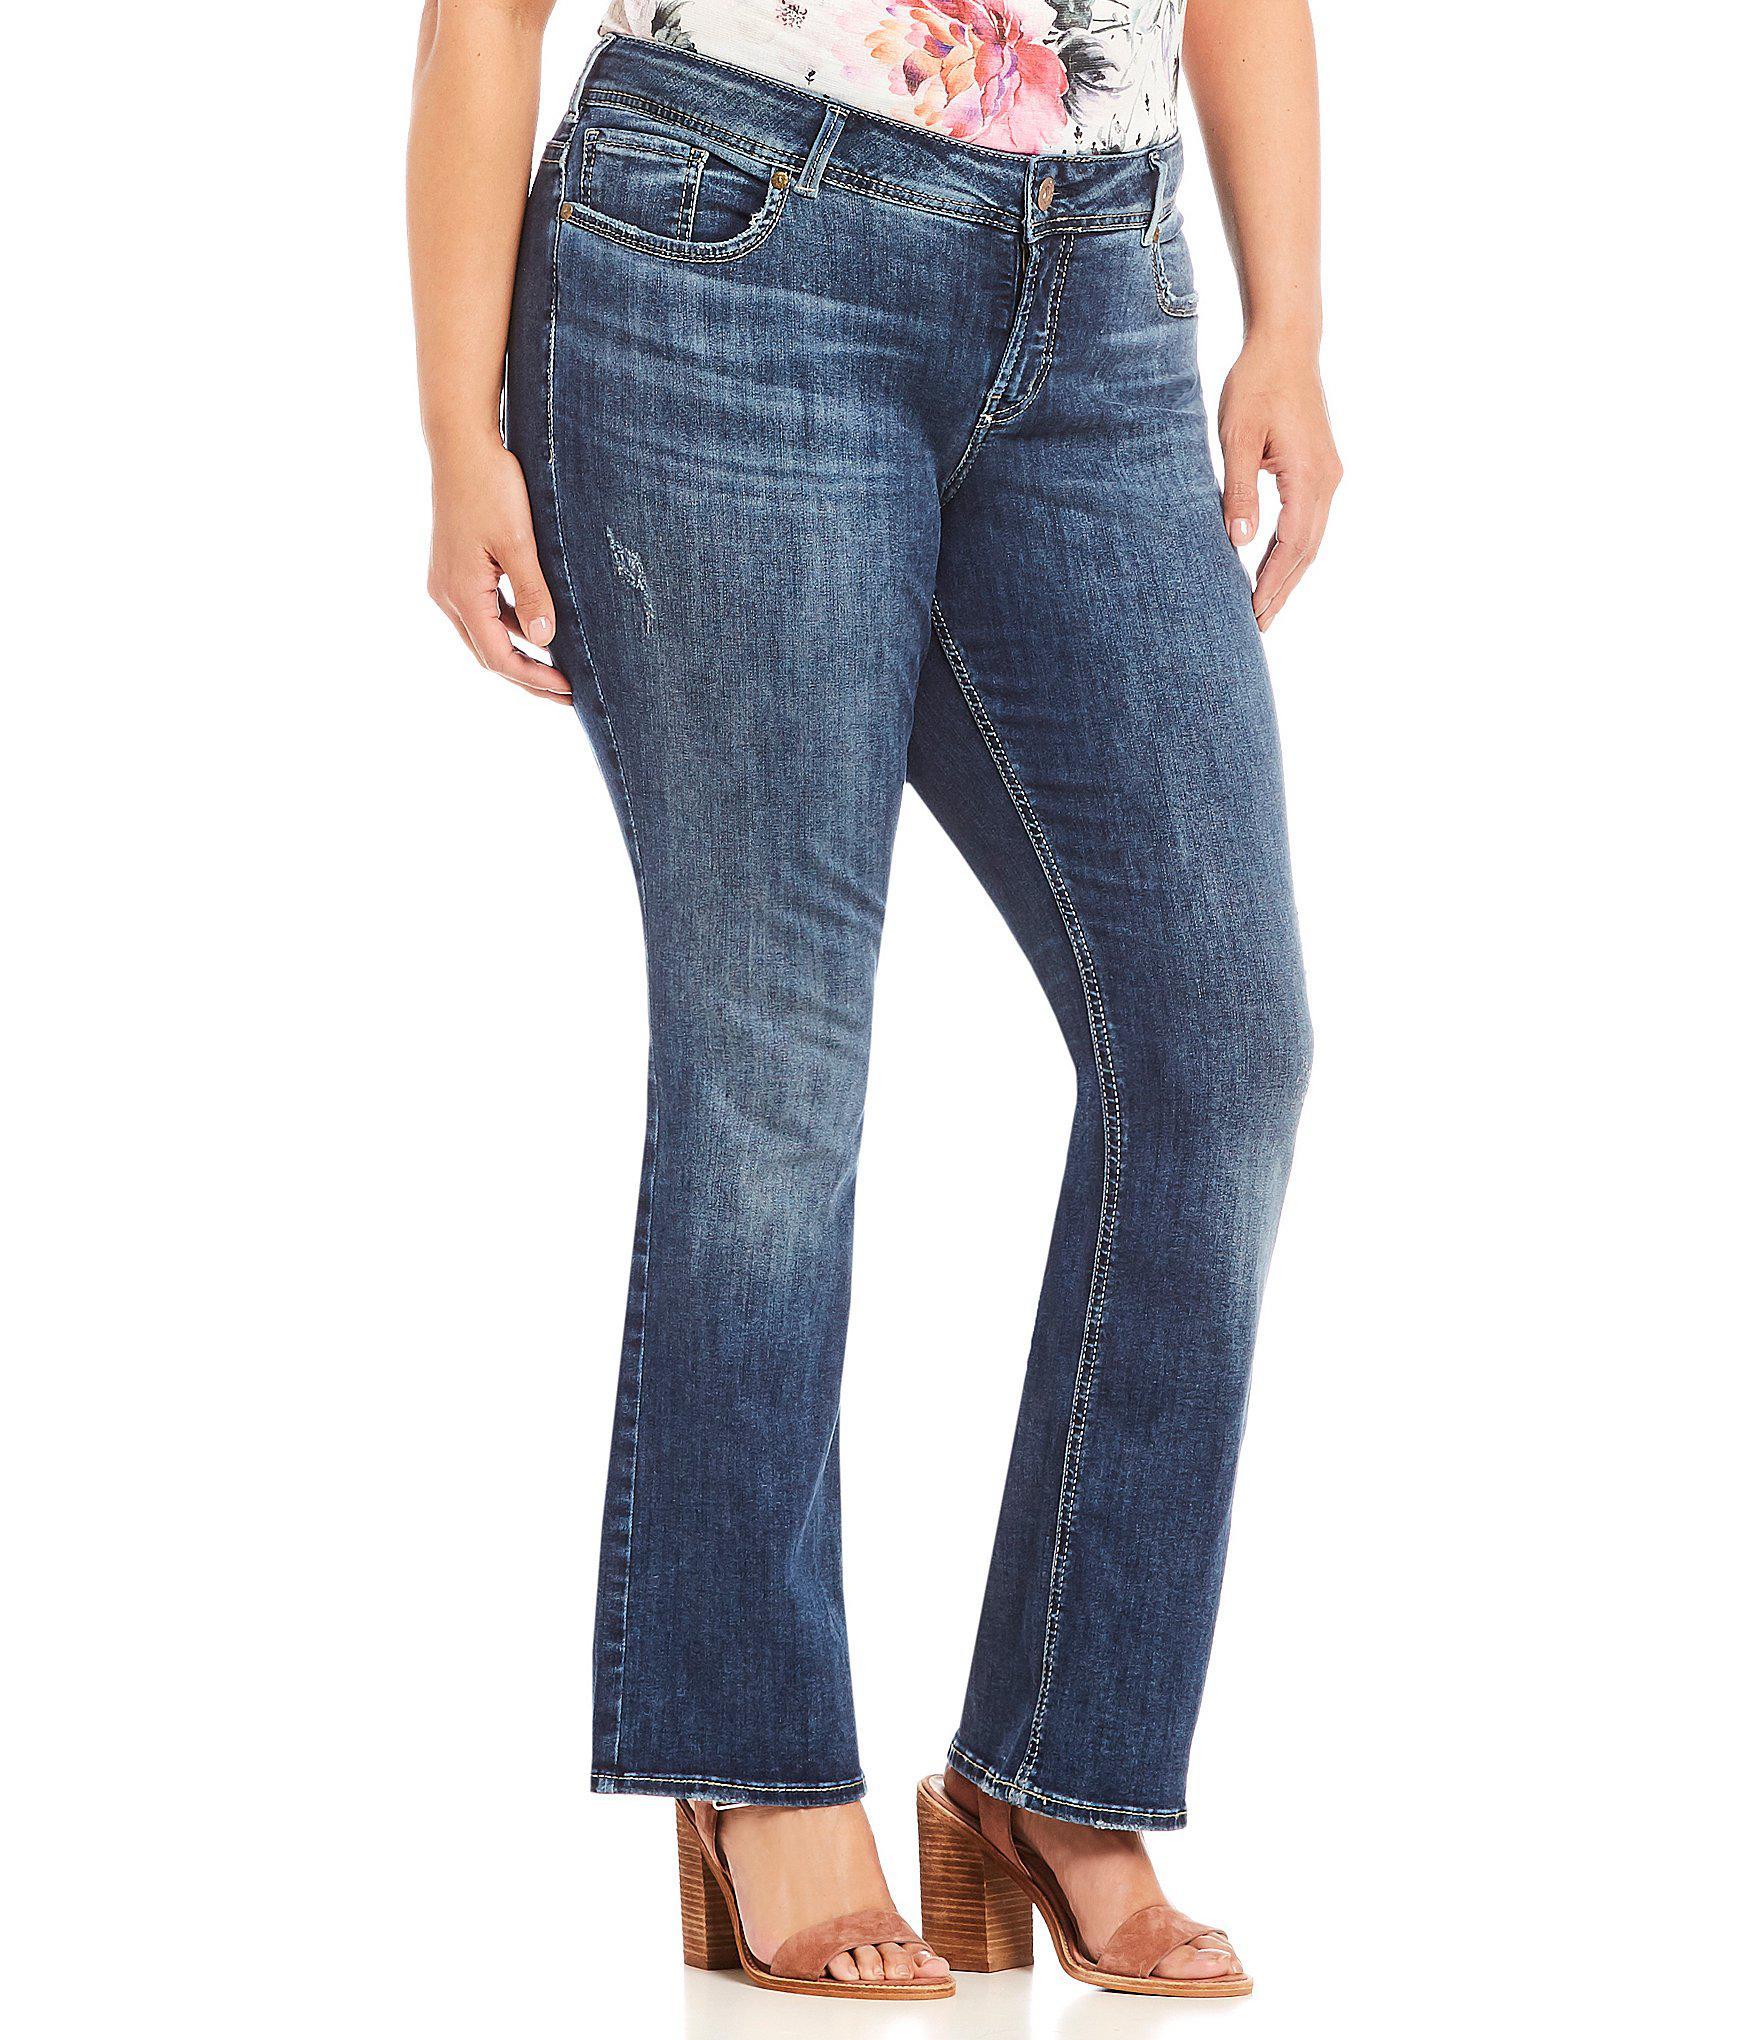 e61fd861509 Lyst - Silver Jeans Co. Plus Size Elyse Slim Bootcut Jeans in Blue